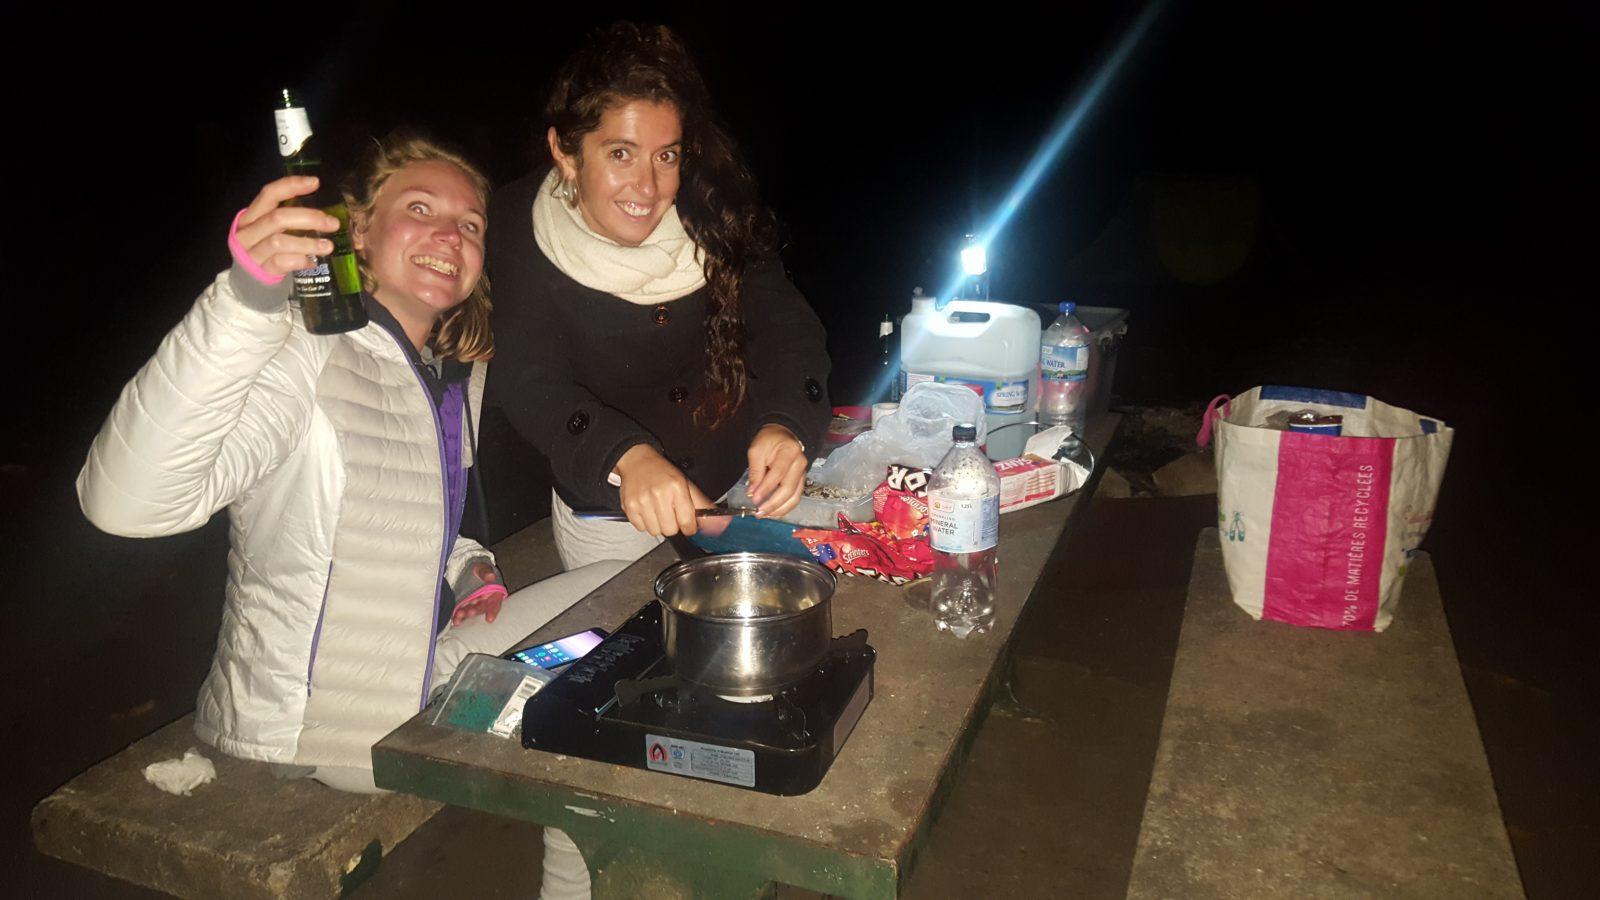 Diner free camp